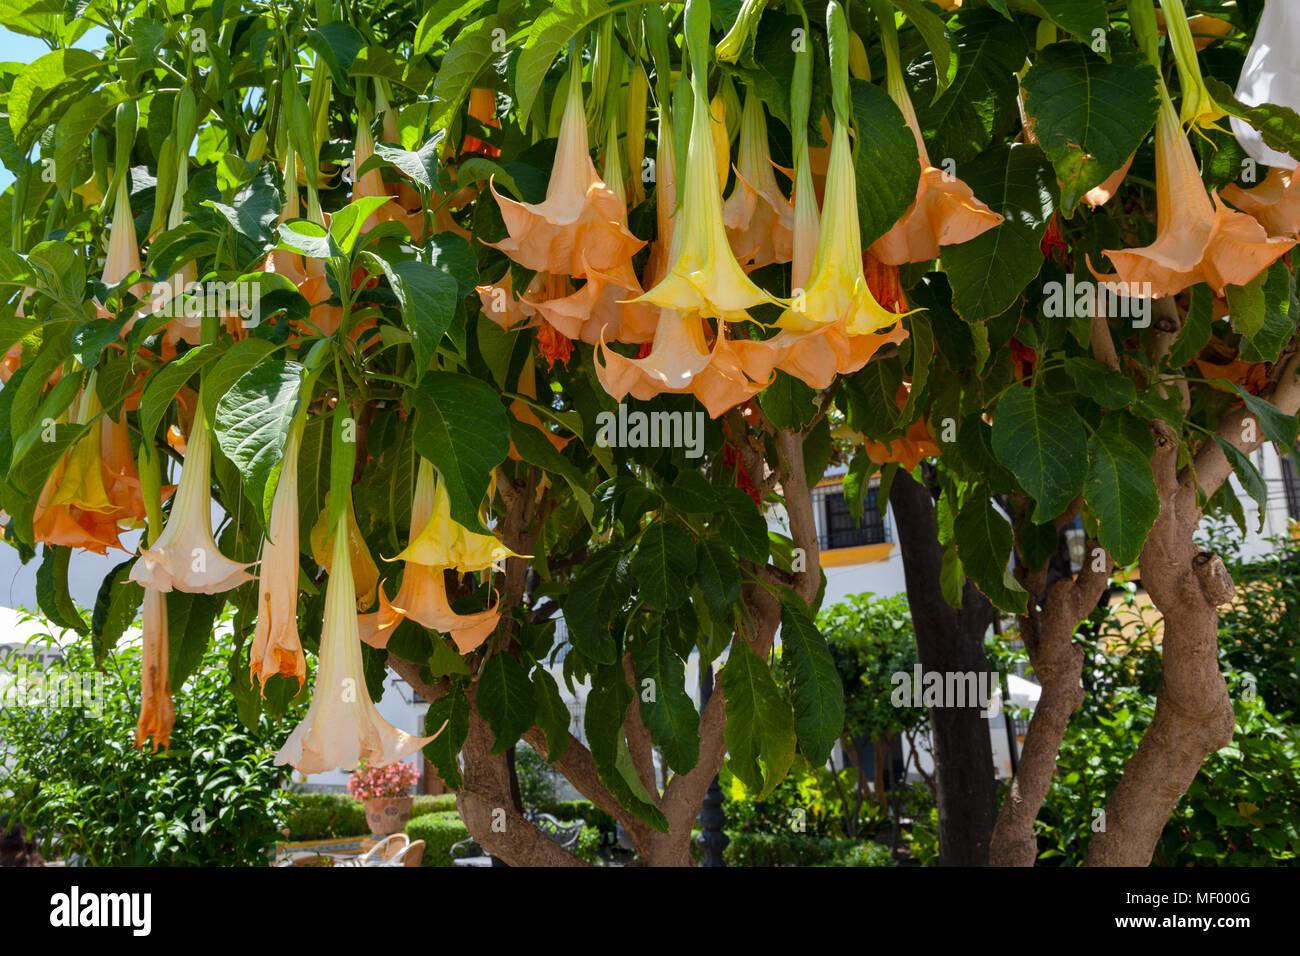 Brugmansia Tree -  Datura Stramonium plant, which contains scopolamine, - Stock Image